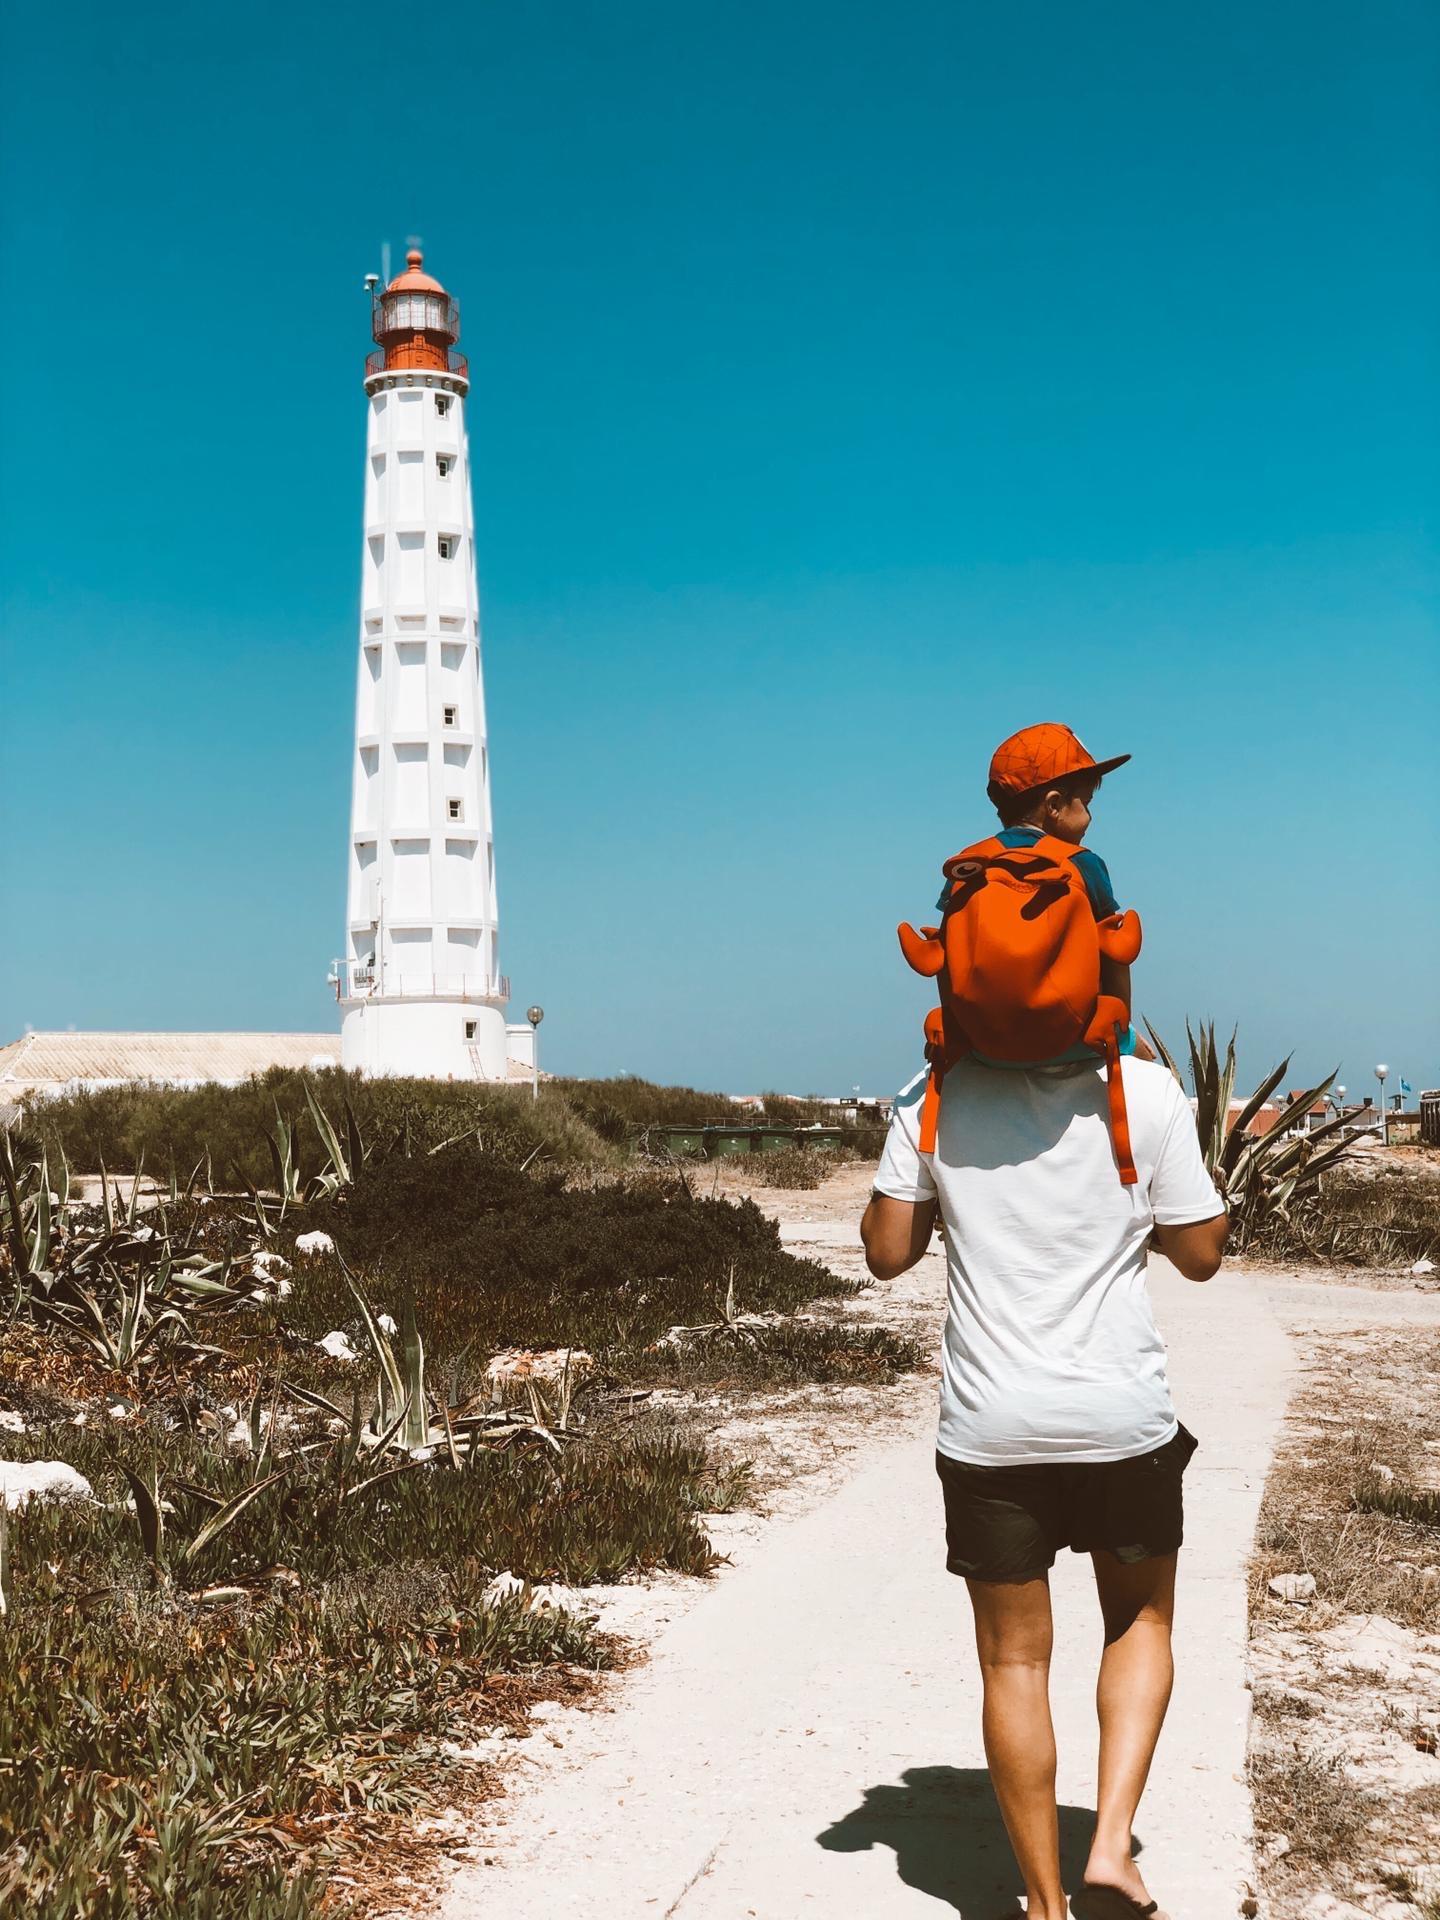 #fathersday #happyfathersday #fatherandson #familyties #pathway #lighthouse #summertime #warmweather #brightsunnyday #bigbluesky #wildplants #sunnylightan